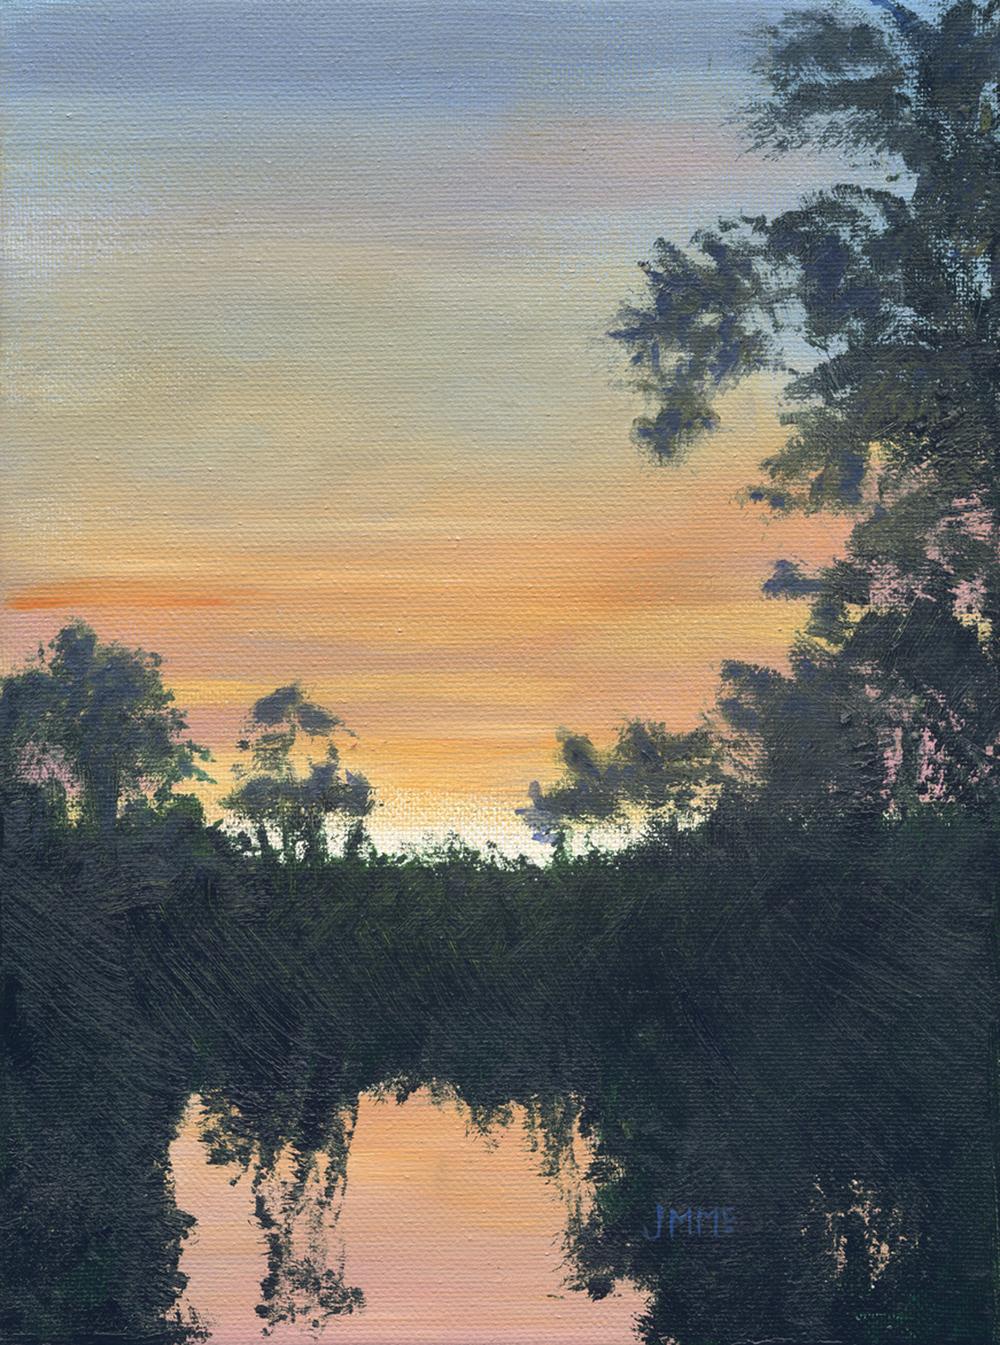 HICKORY LAKE